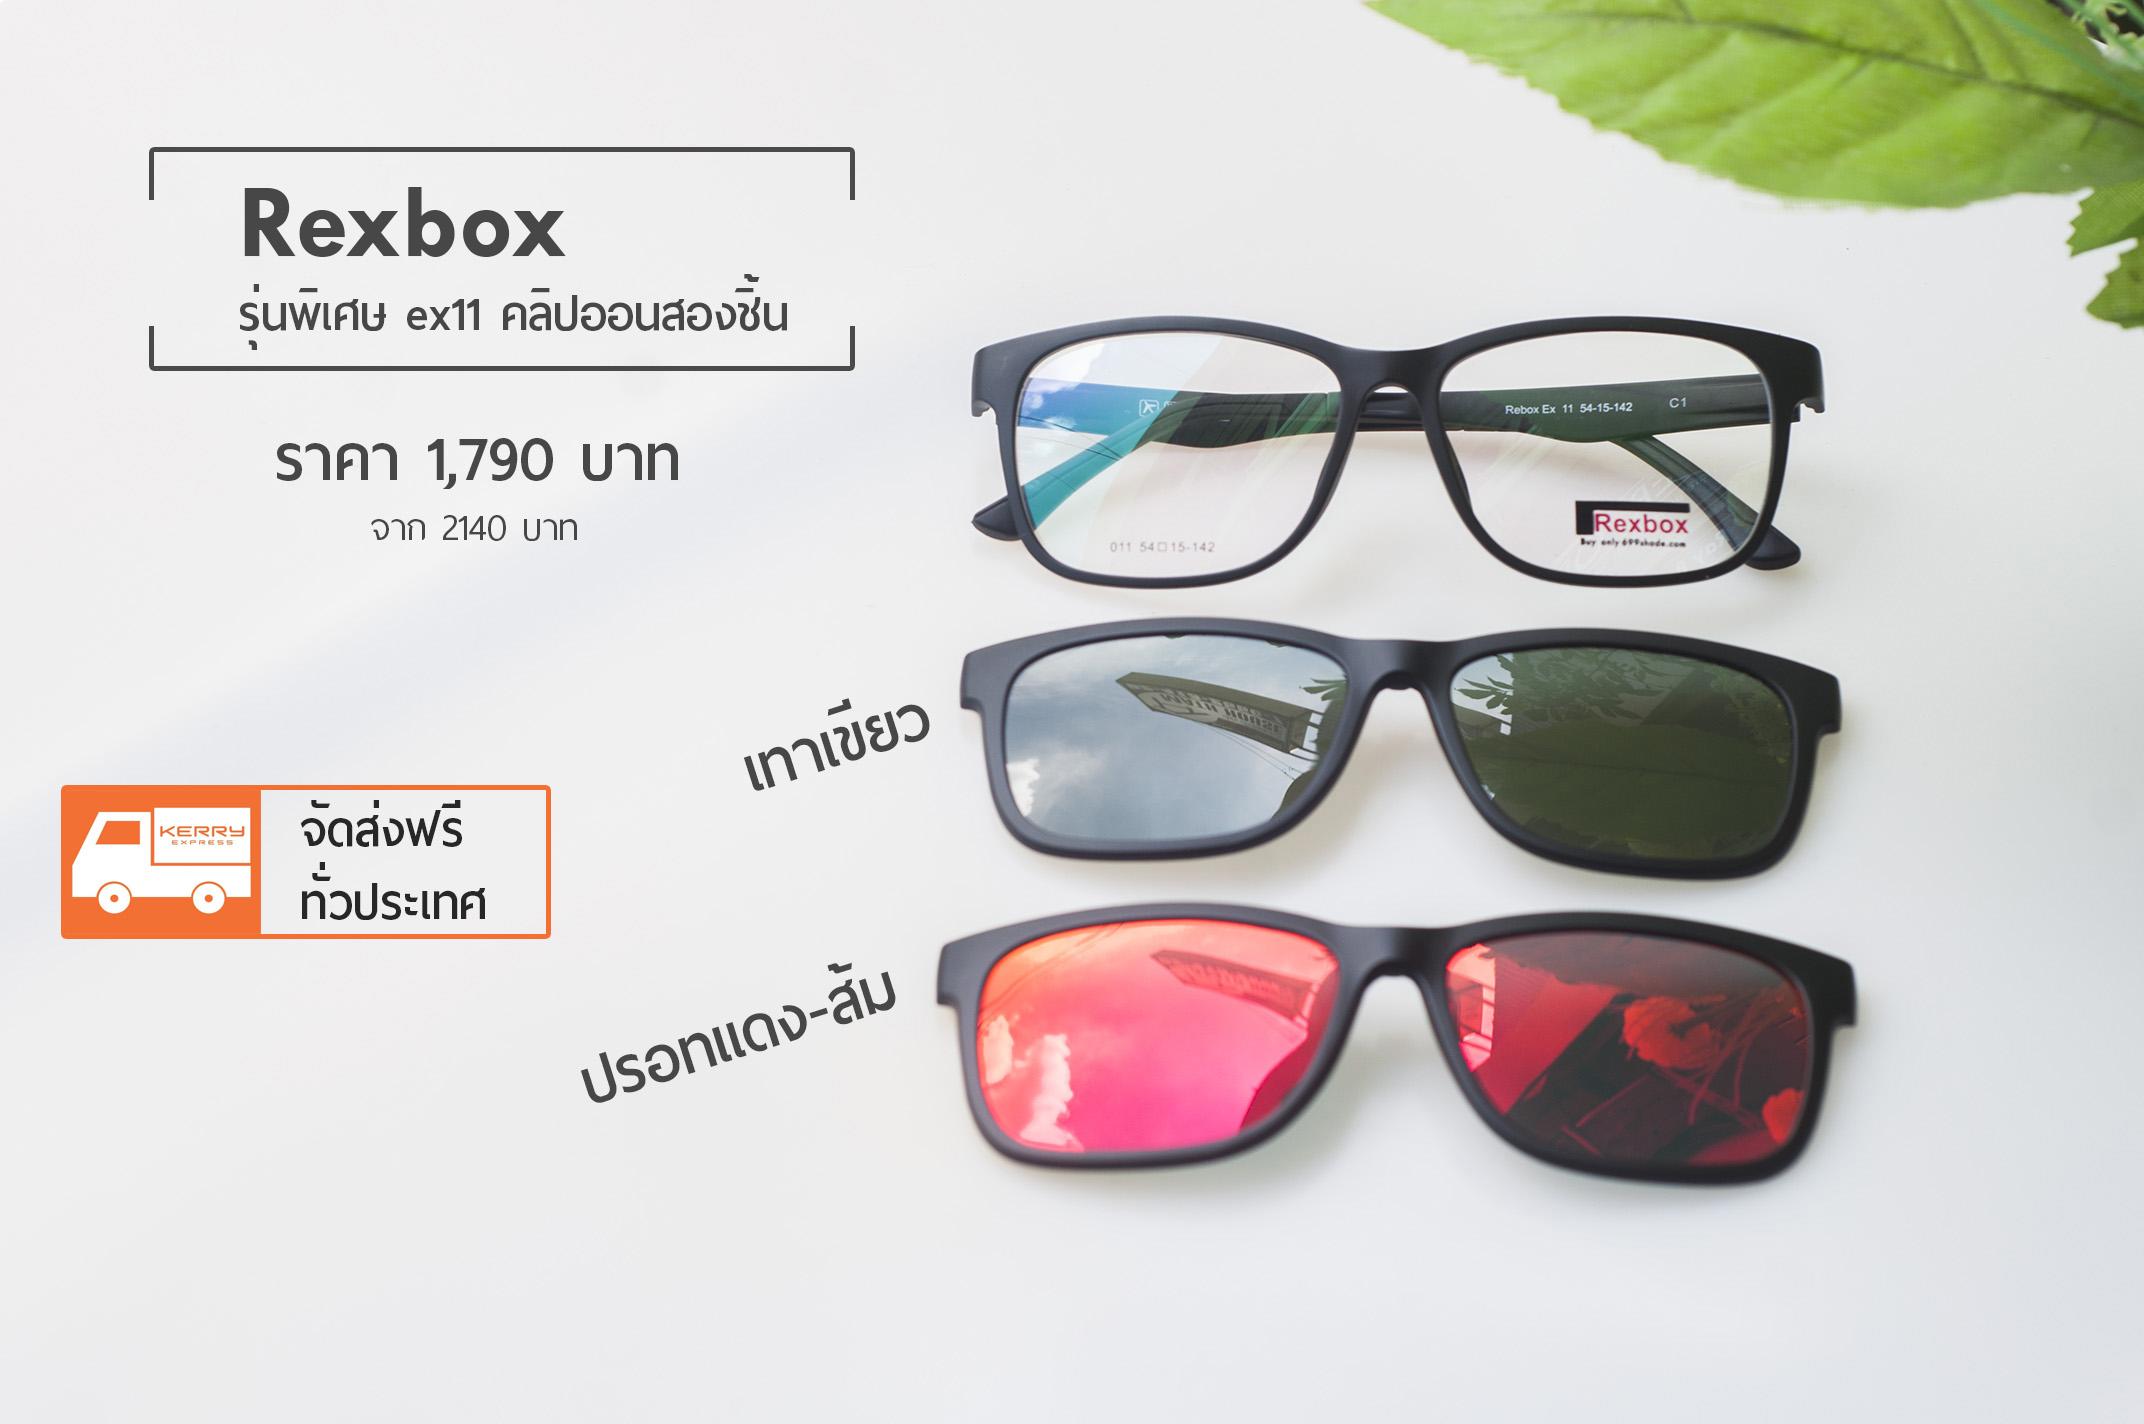 Rexbox ex11 พร้อมคลิปออน 2 ชิ้น คุ้มค่า คุ้มราคา